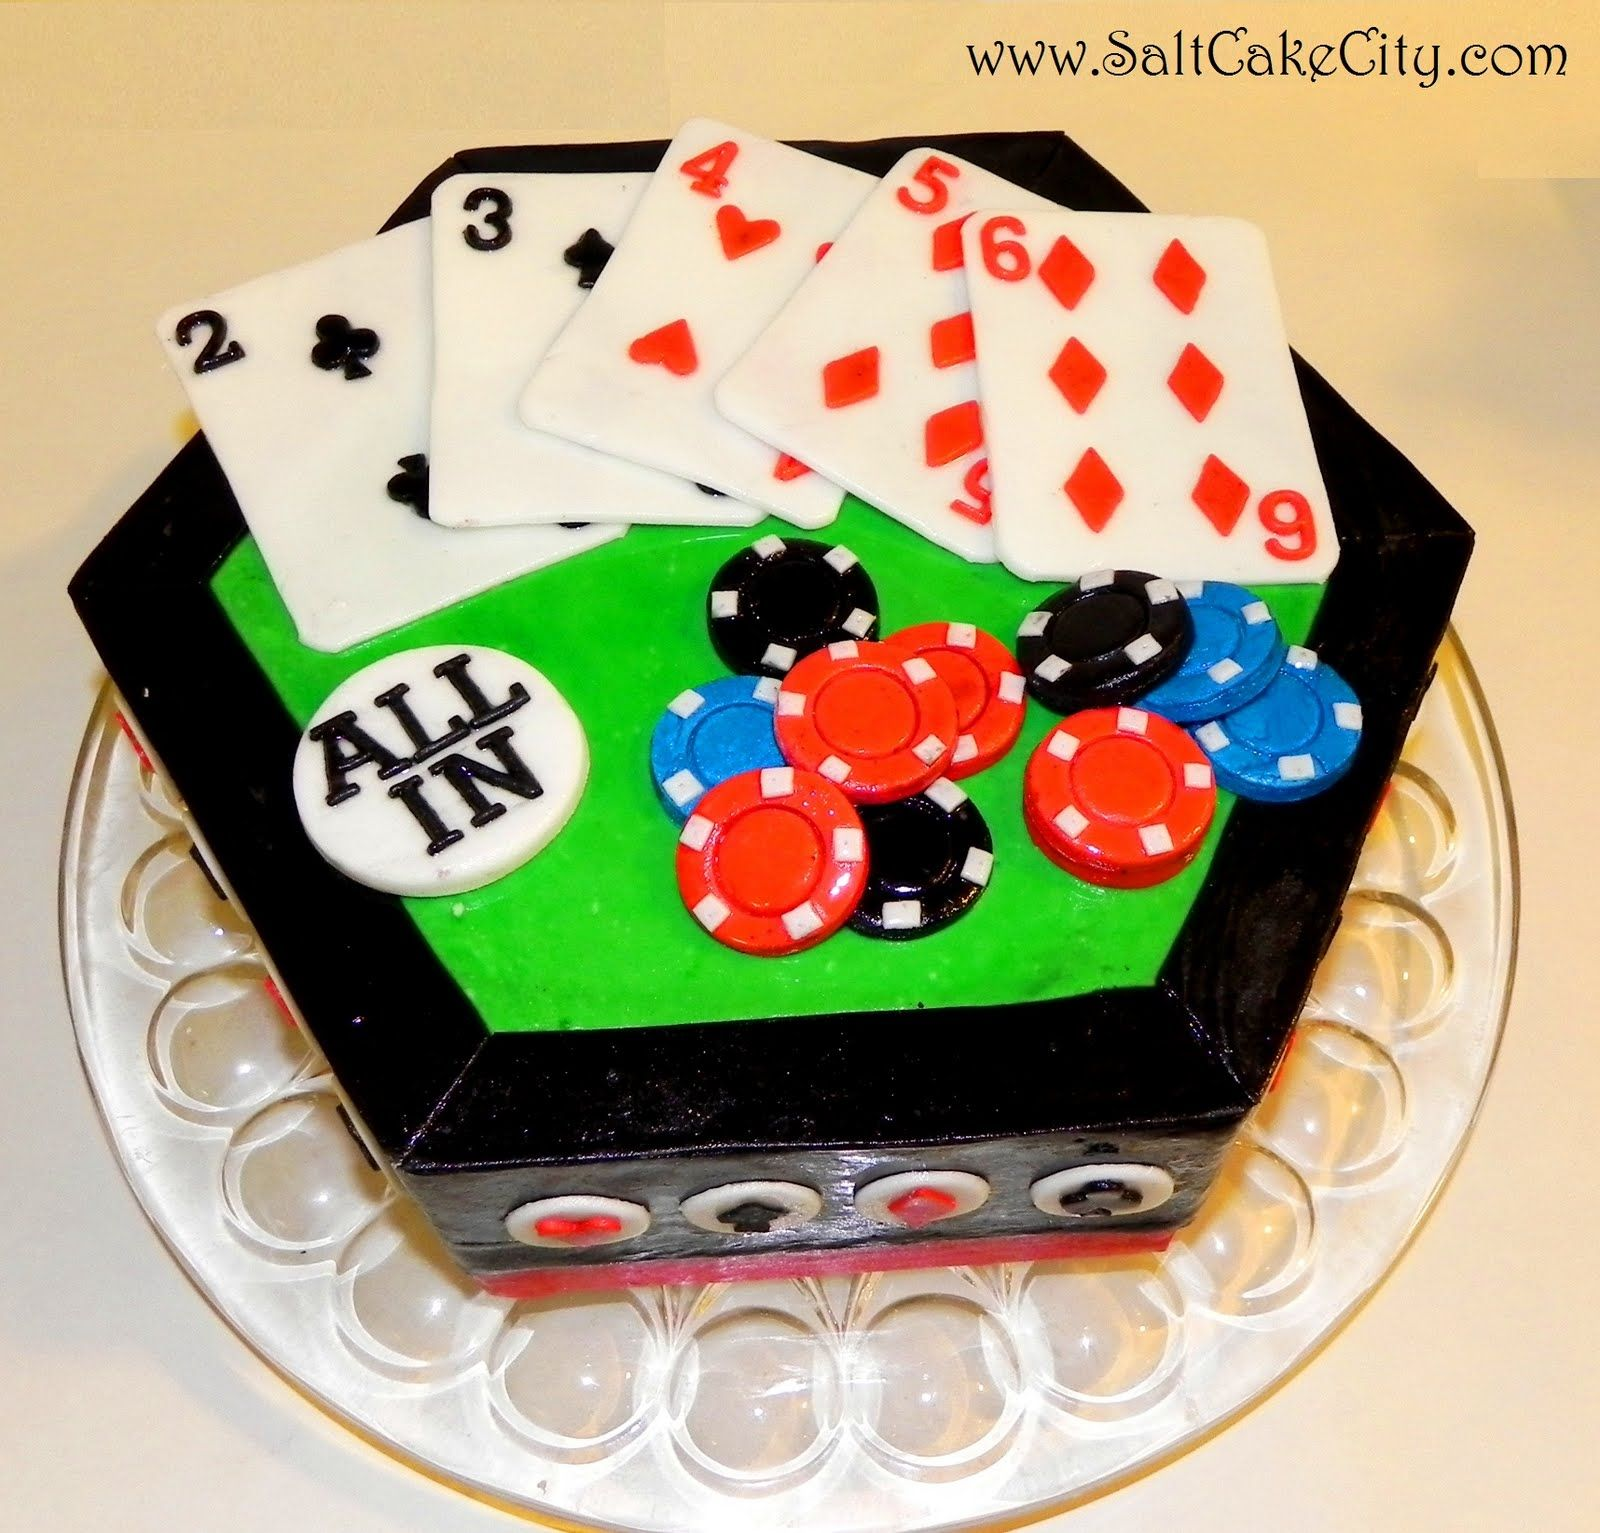 Poker Birthday Cake Ideas Party City Casino No Deposit Bonus Code 2018